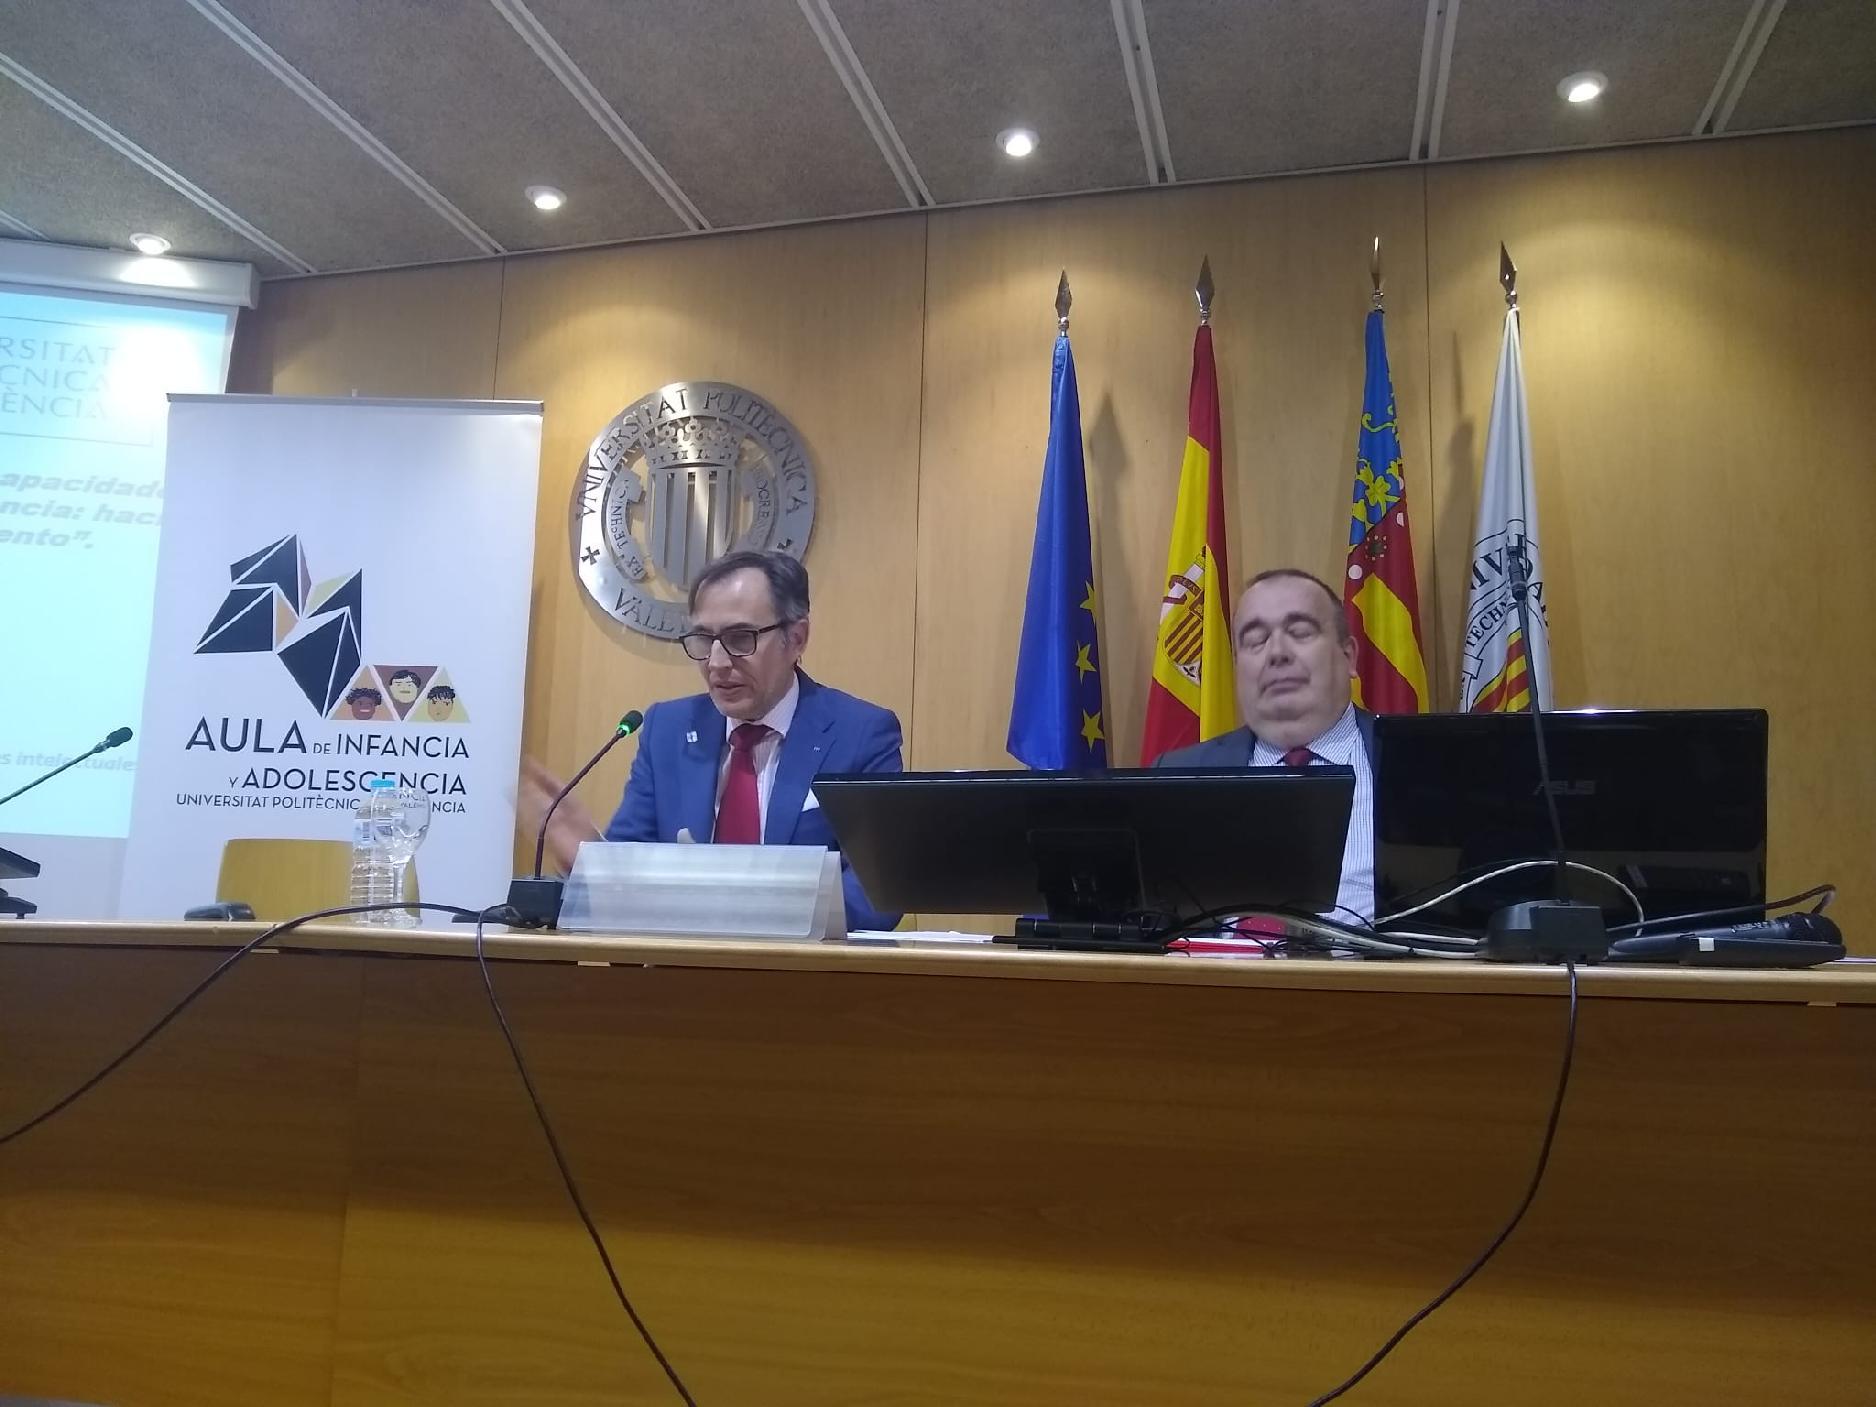 José Luis López González-jornadas educativas